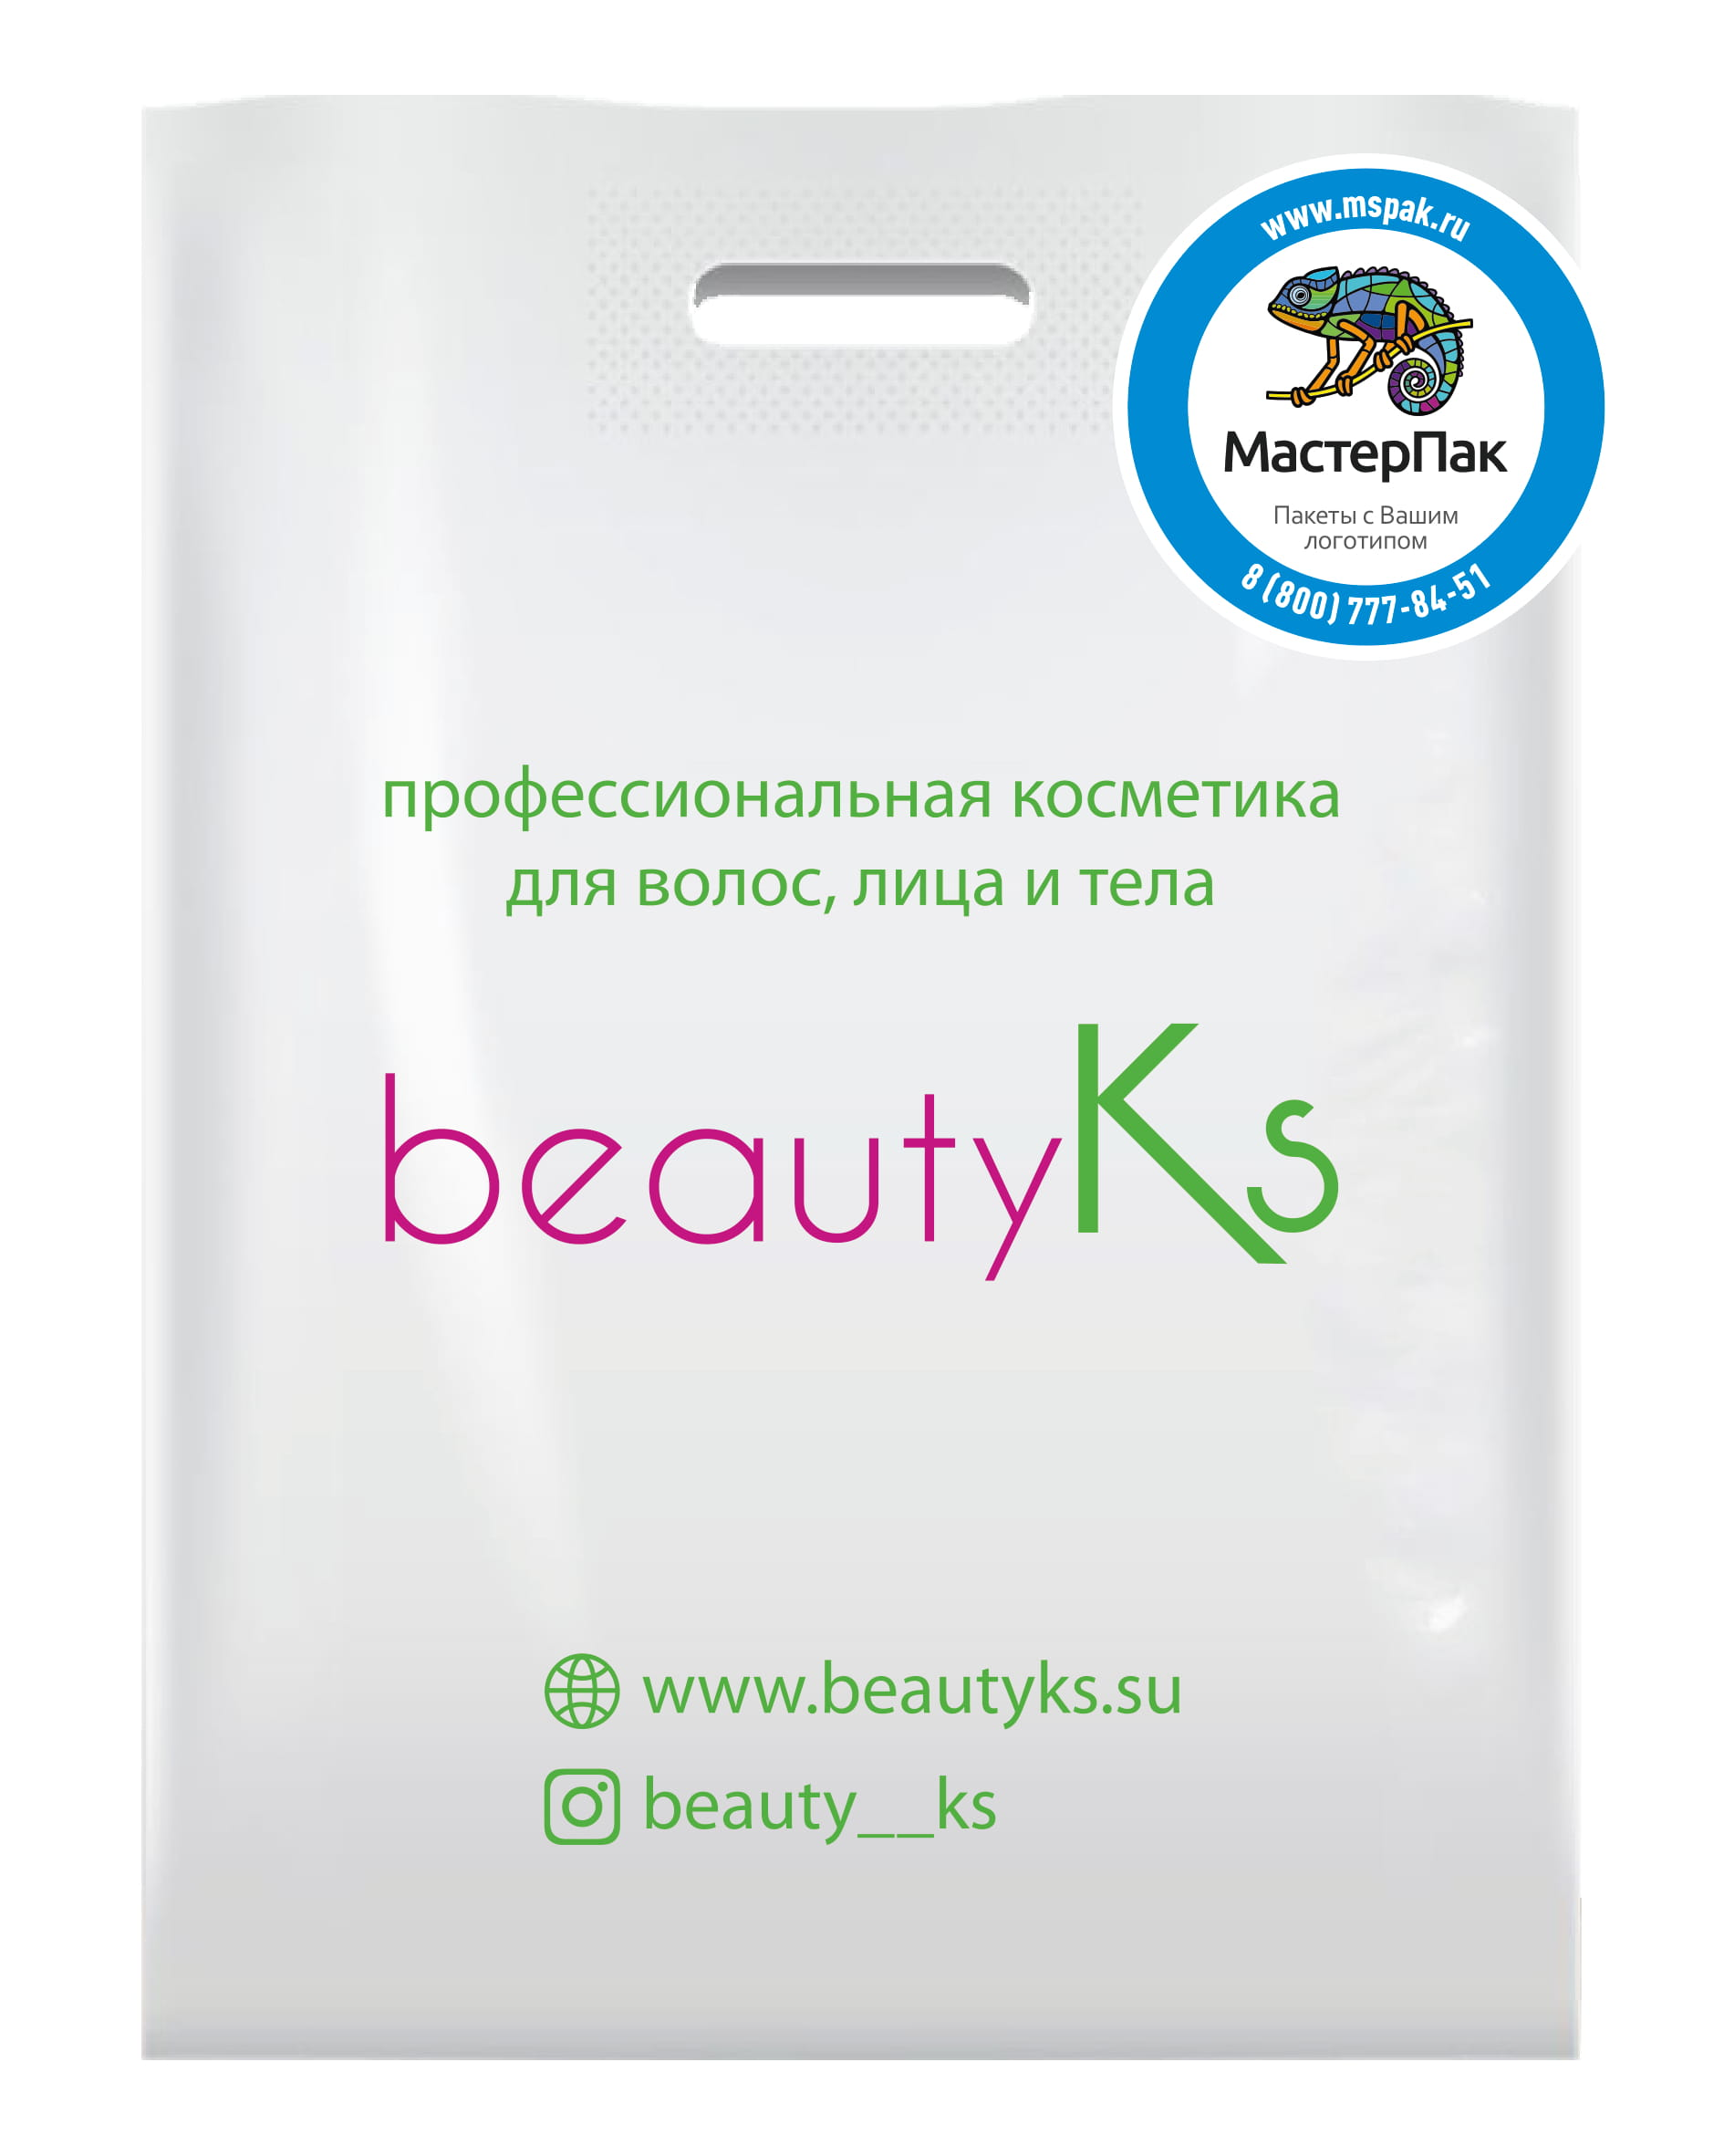 Пакет ПВД с логотипом Beauty KS, Москва, 70 мкм, 30*40, белый